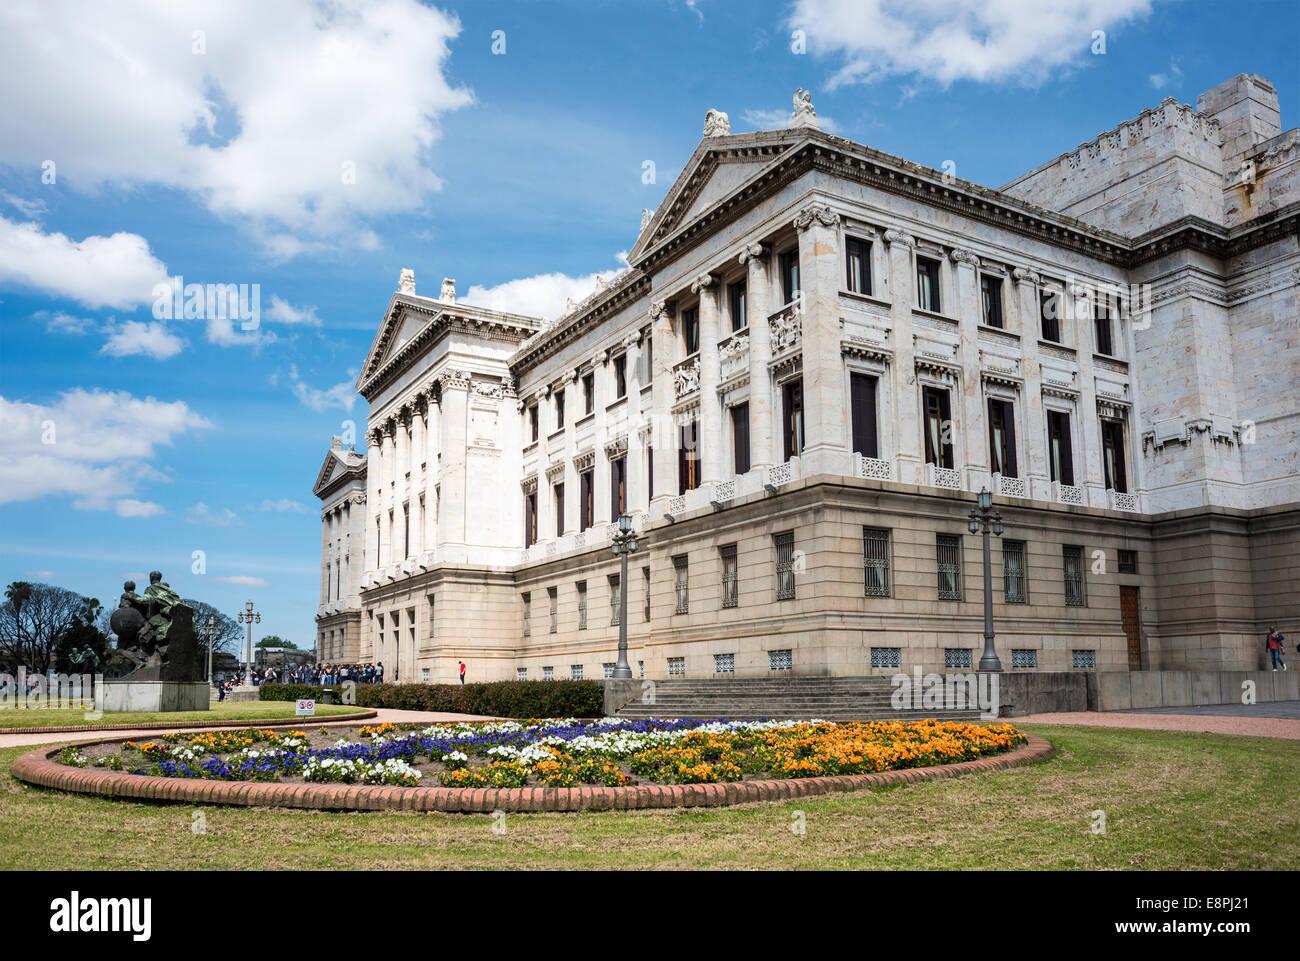 Government Palace Palacio Legislativo in Montevideo, Uruguay - Stock Image